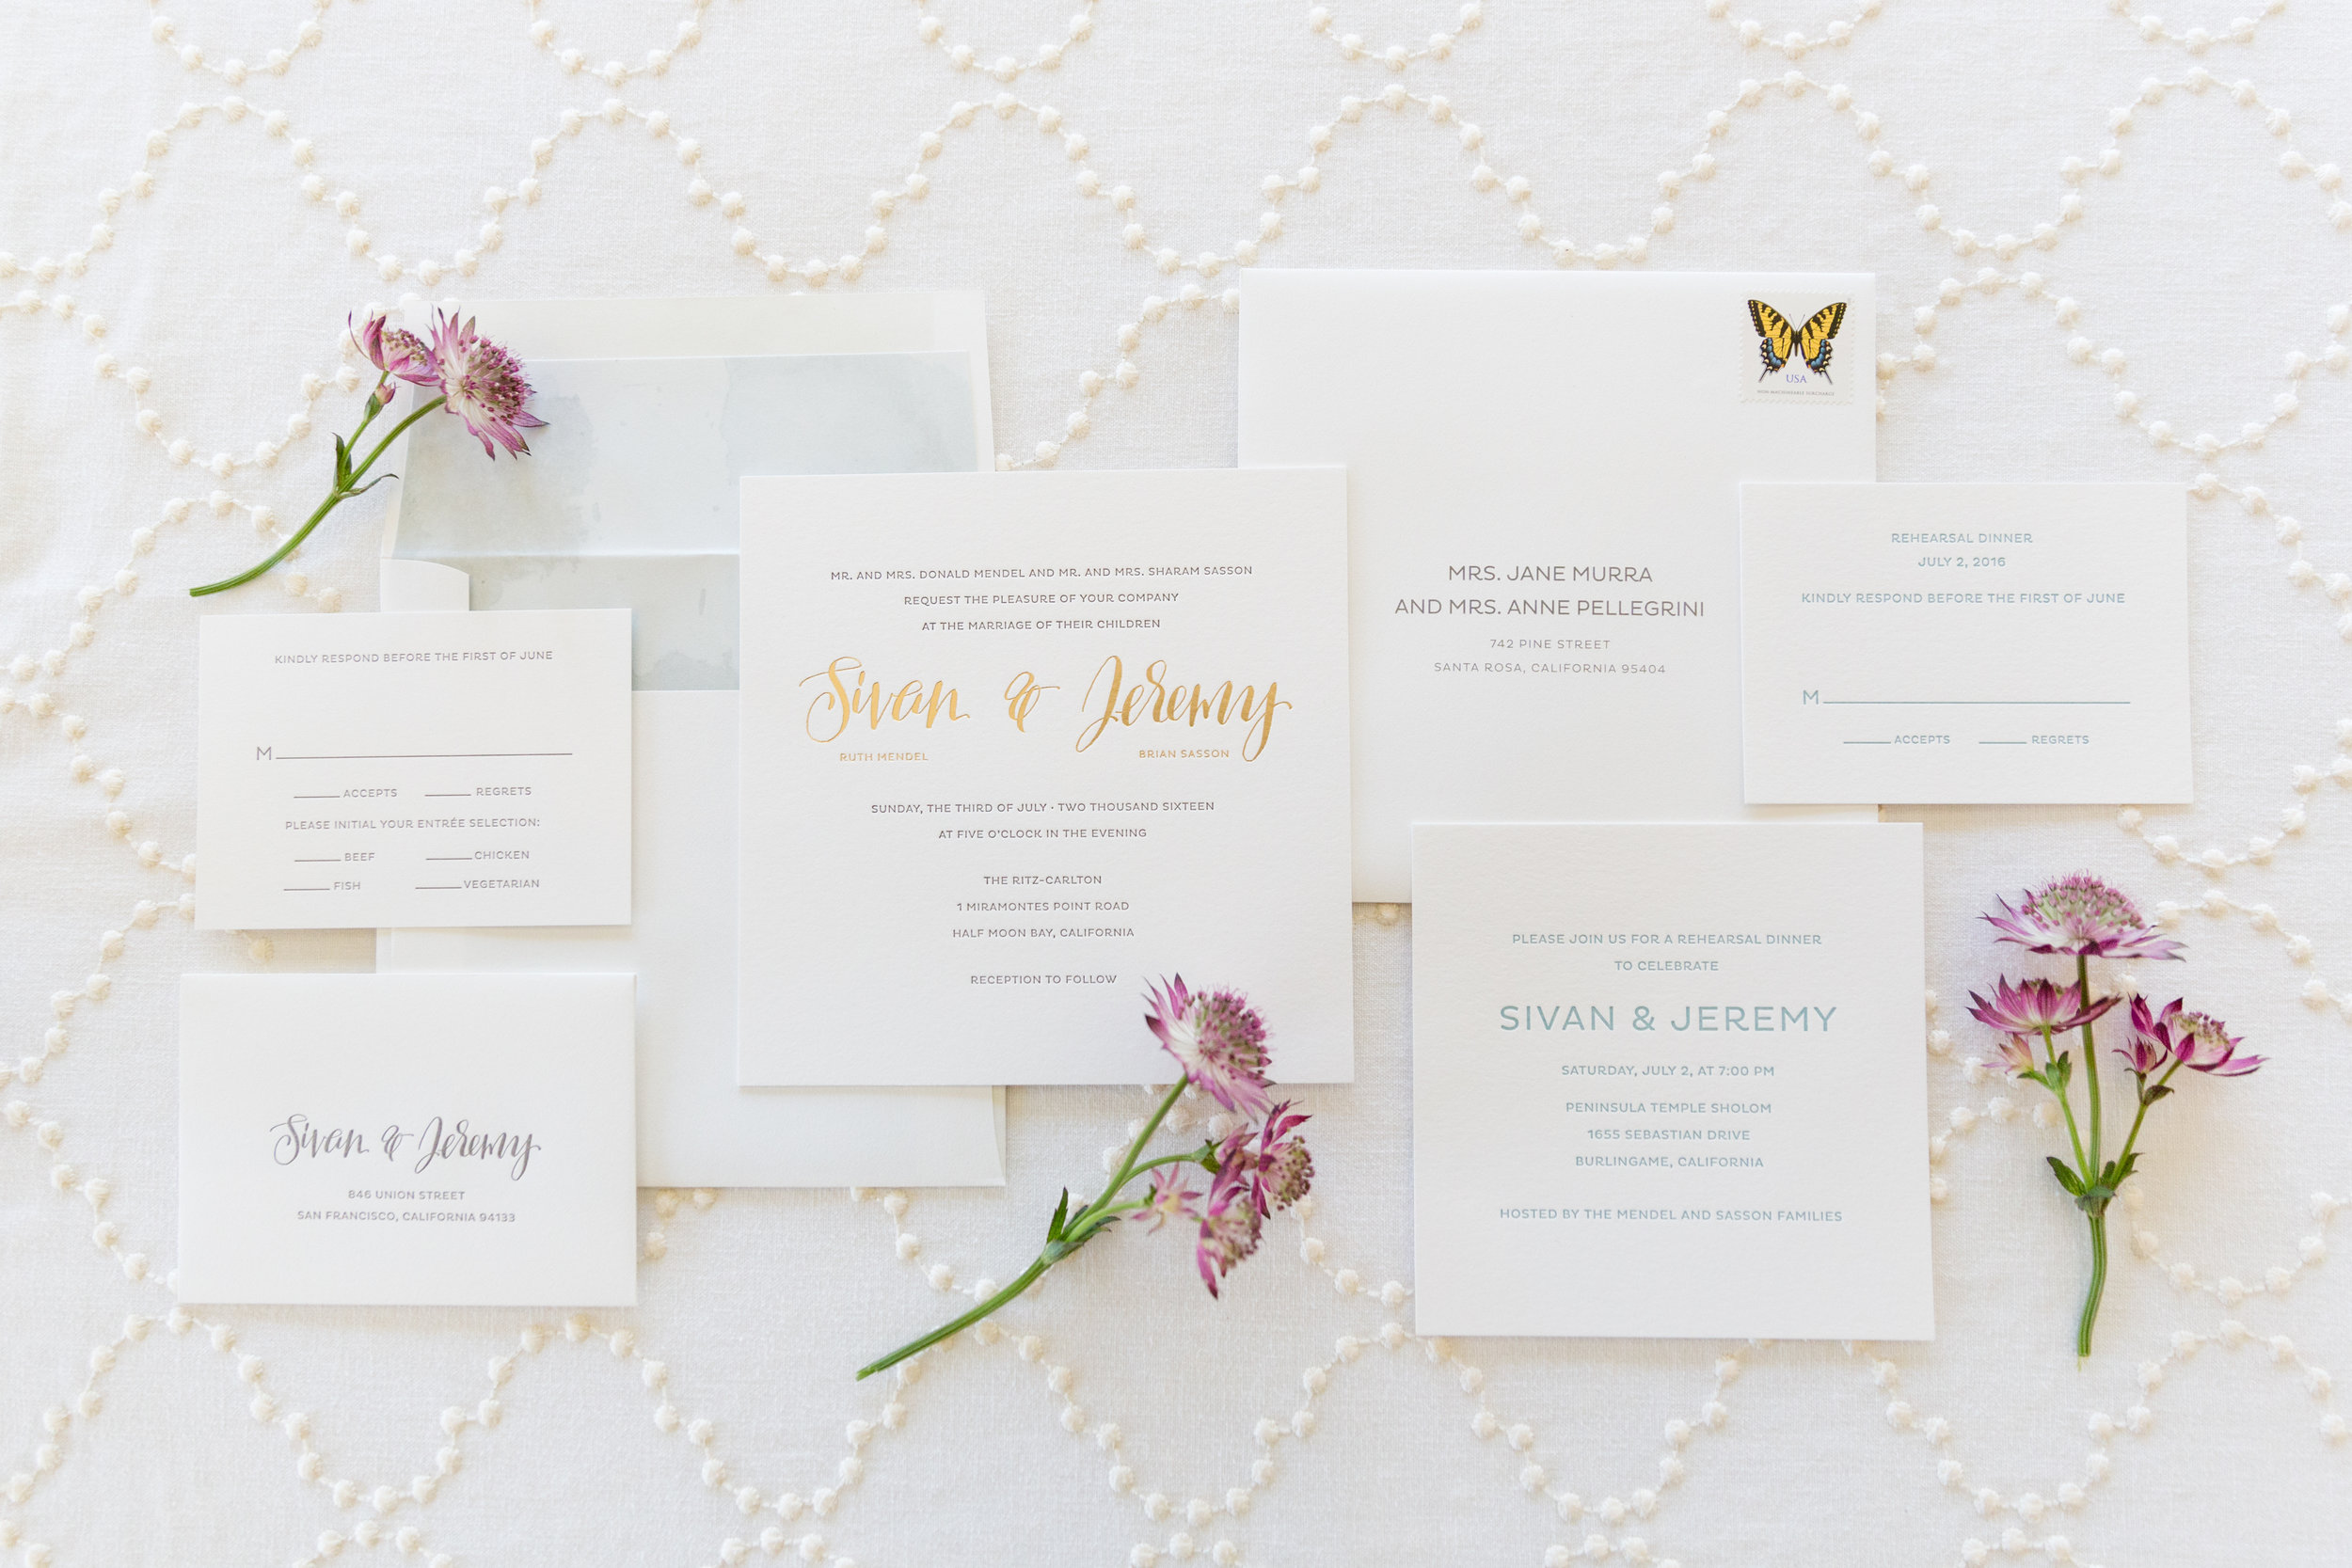 larissa-cleveland-sivanjeremy-wedding-0005-2.jpg